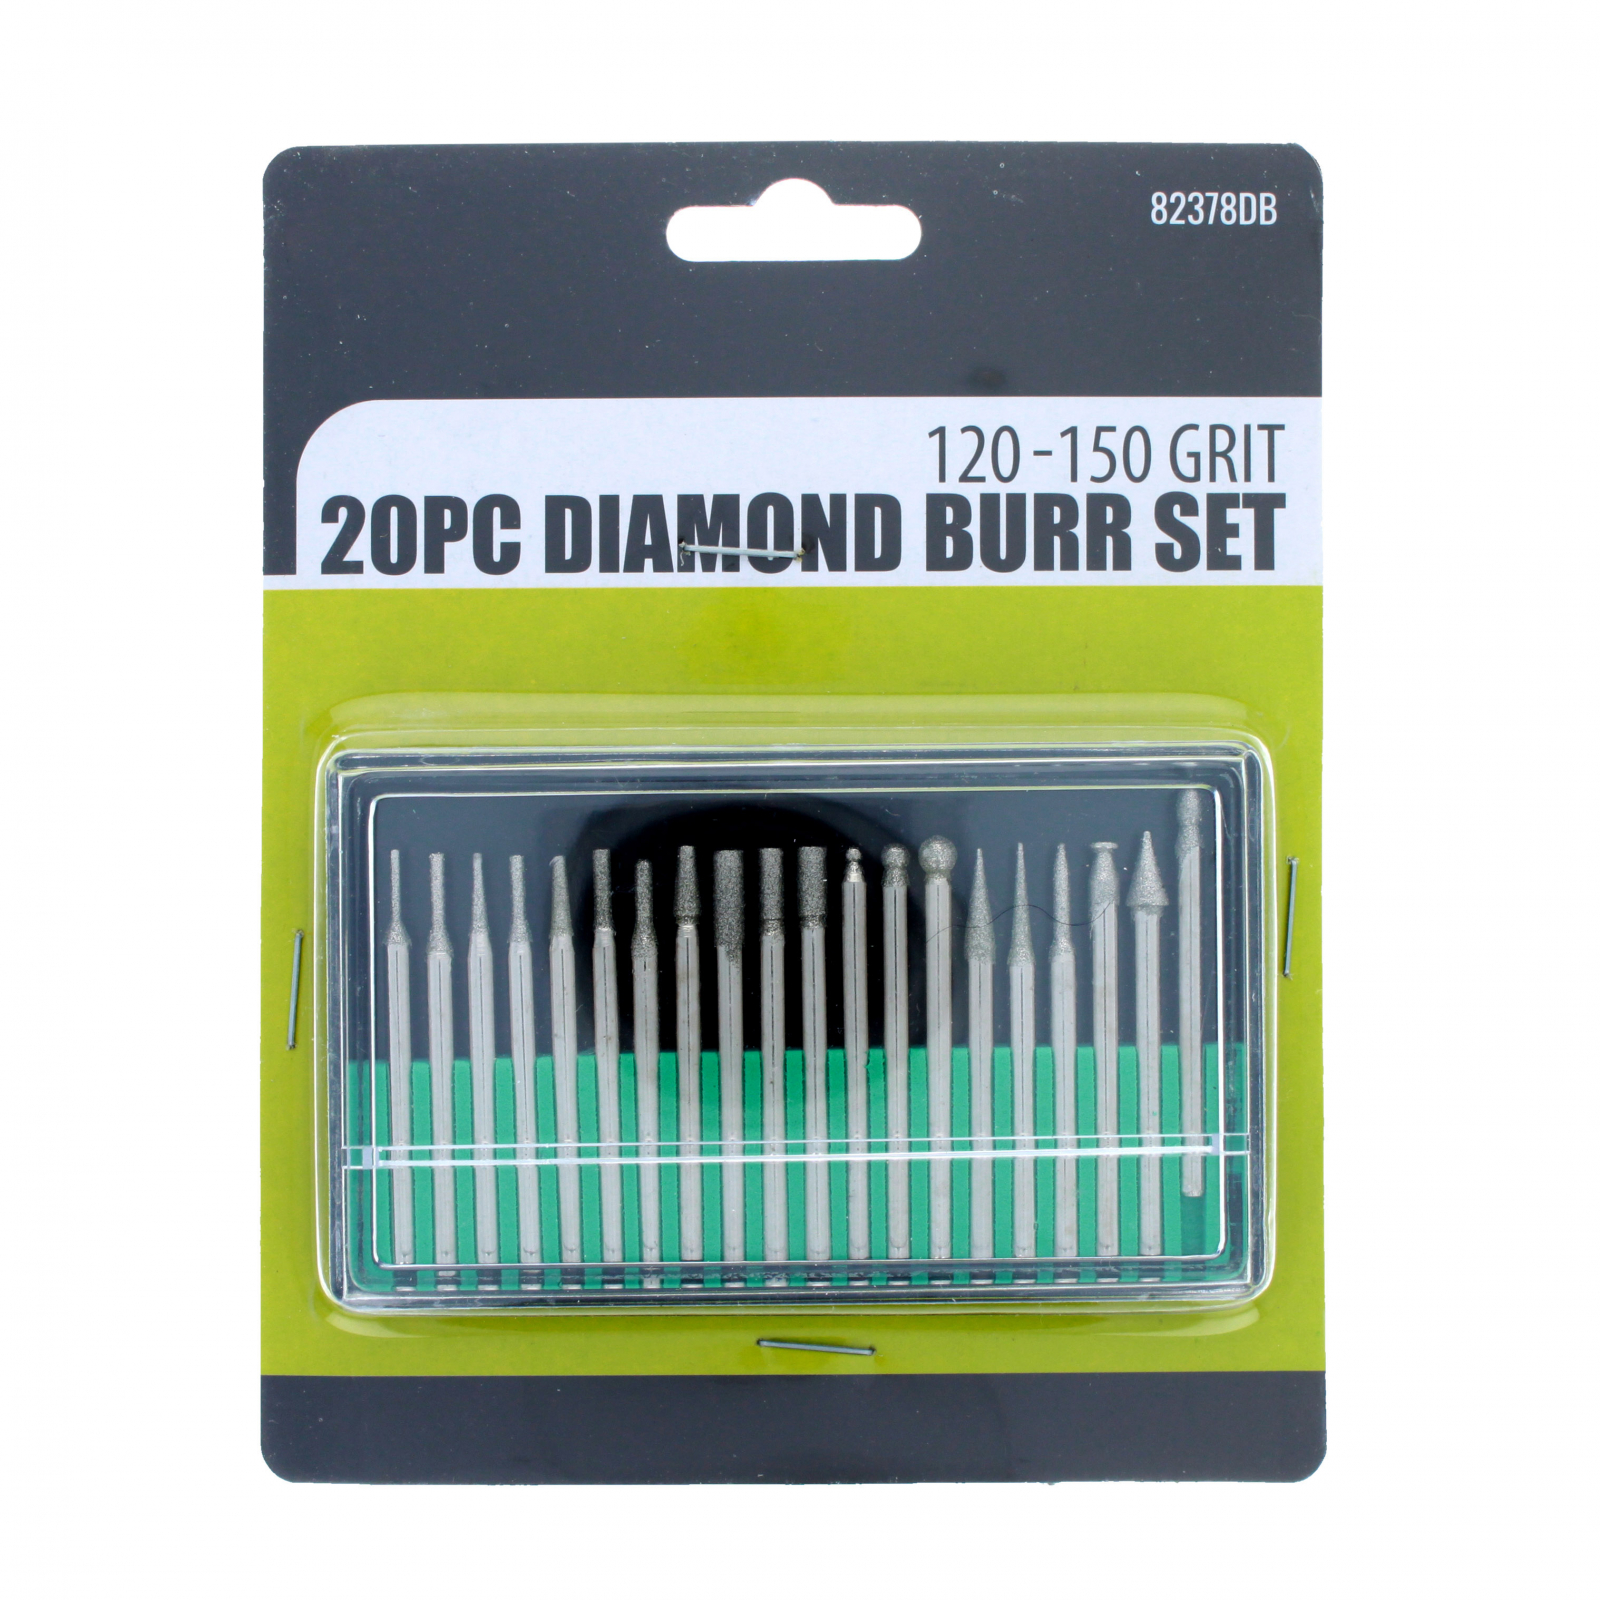 Universal Tool Assorted Diamond Burr Set 120-150 Grit 20pcs